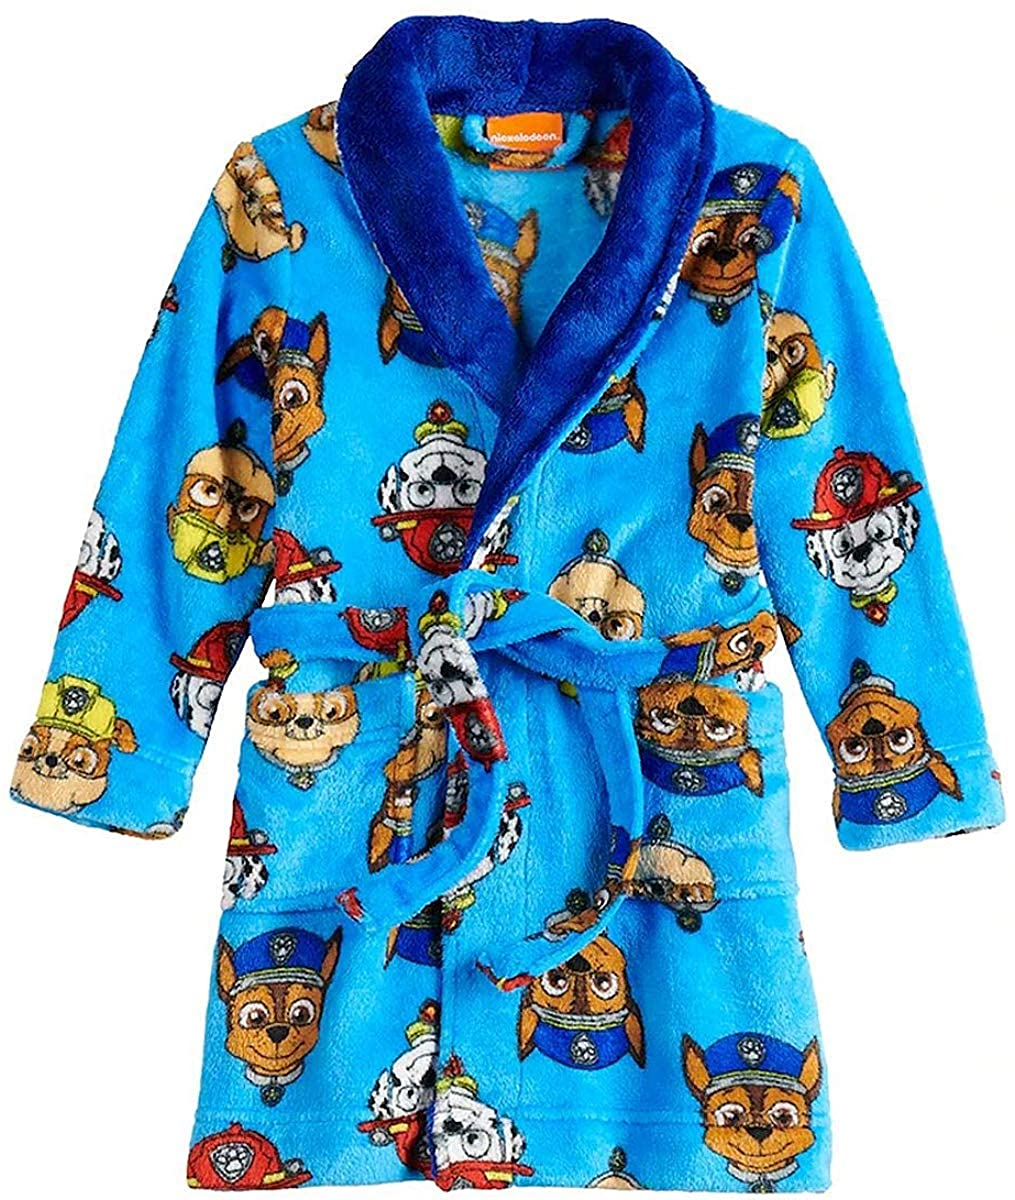 Robe American Marketing Paw Patrol Character Toddler Boys Luxe Fleece and Sherpa Bathrobe